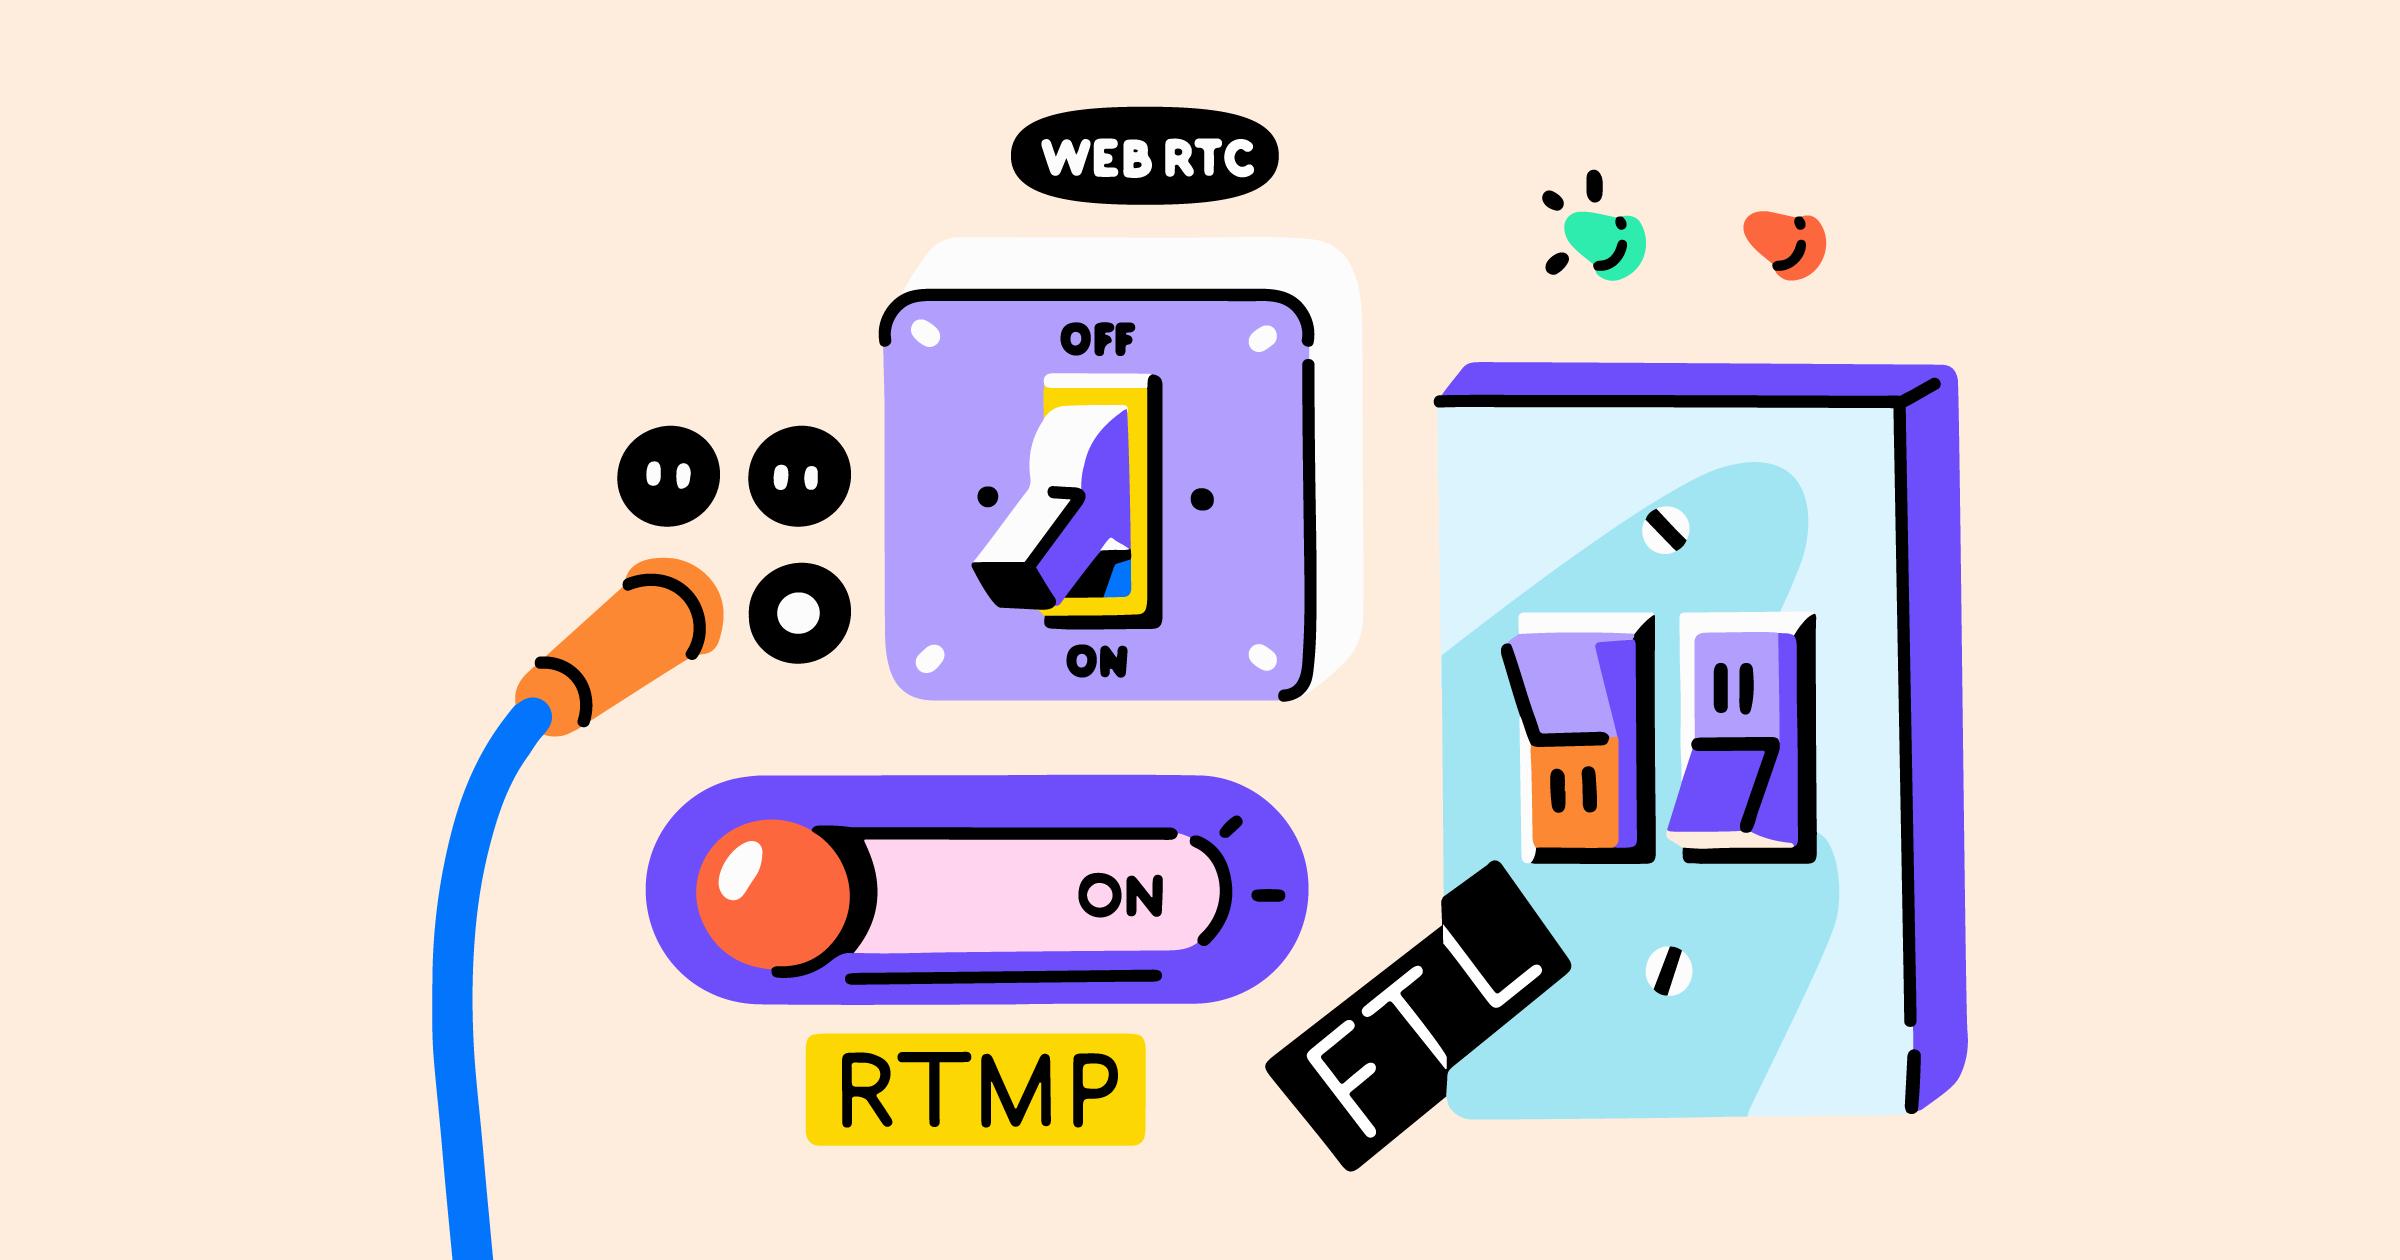 Video streaming protocols explained: RTMP, HLS, WebRTC, FTL